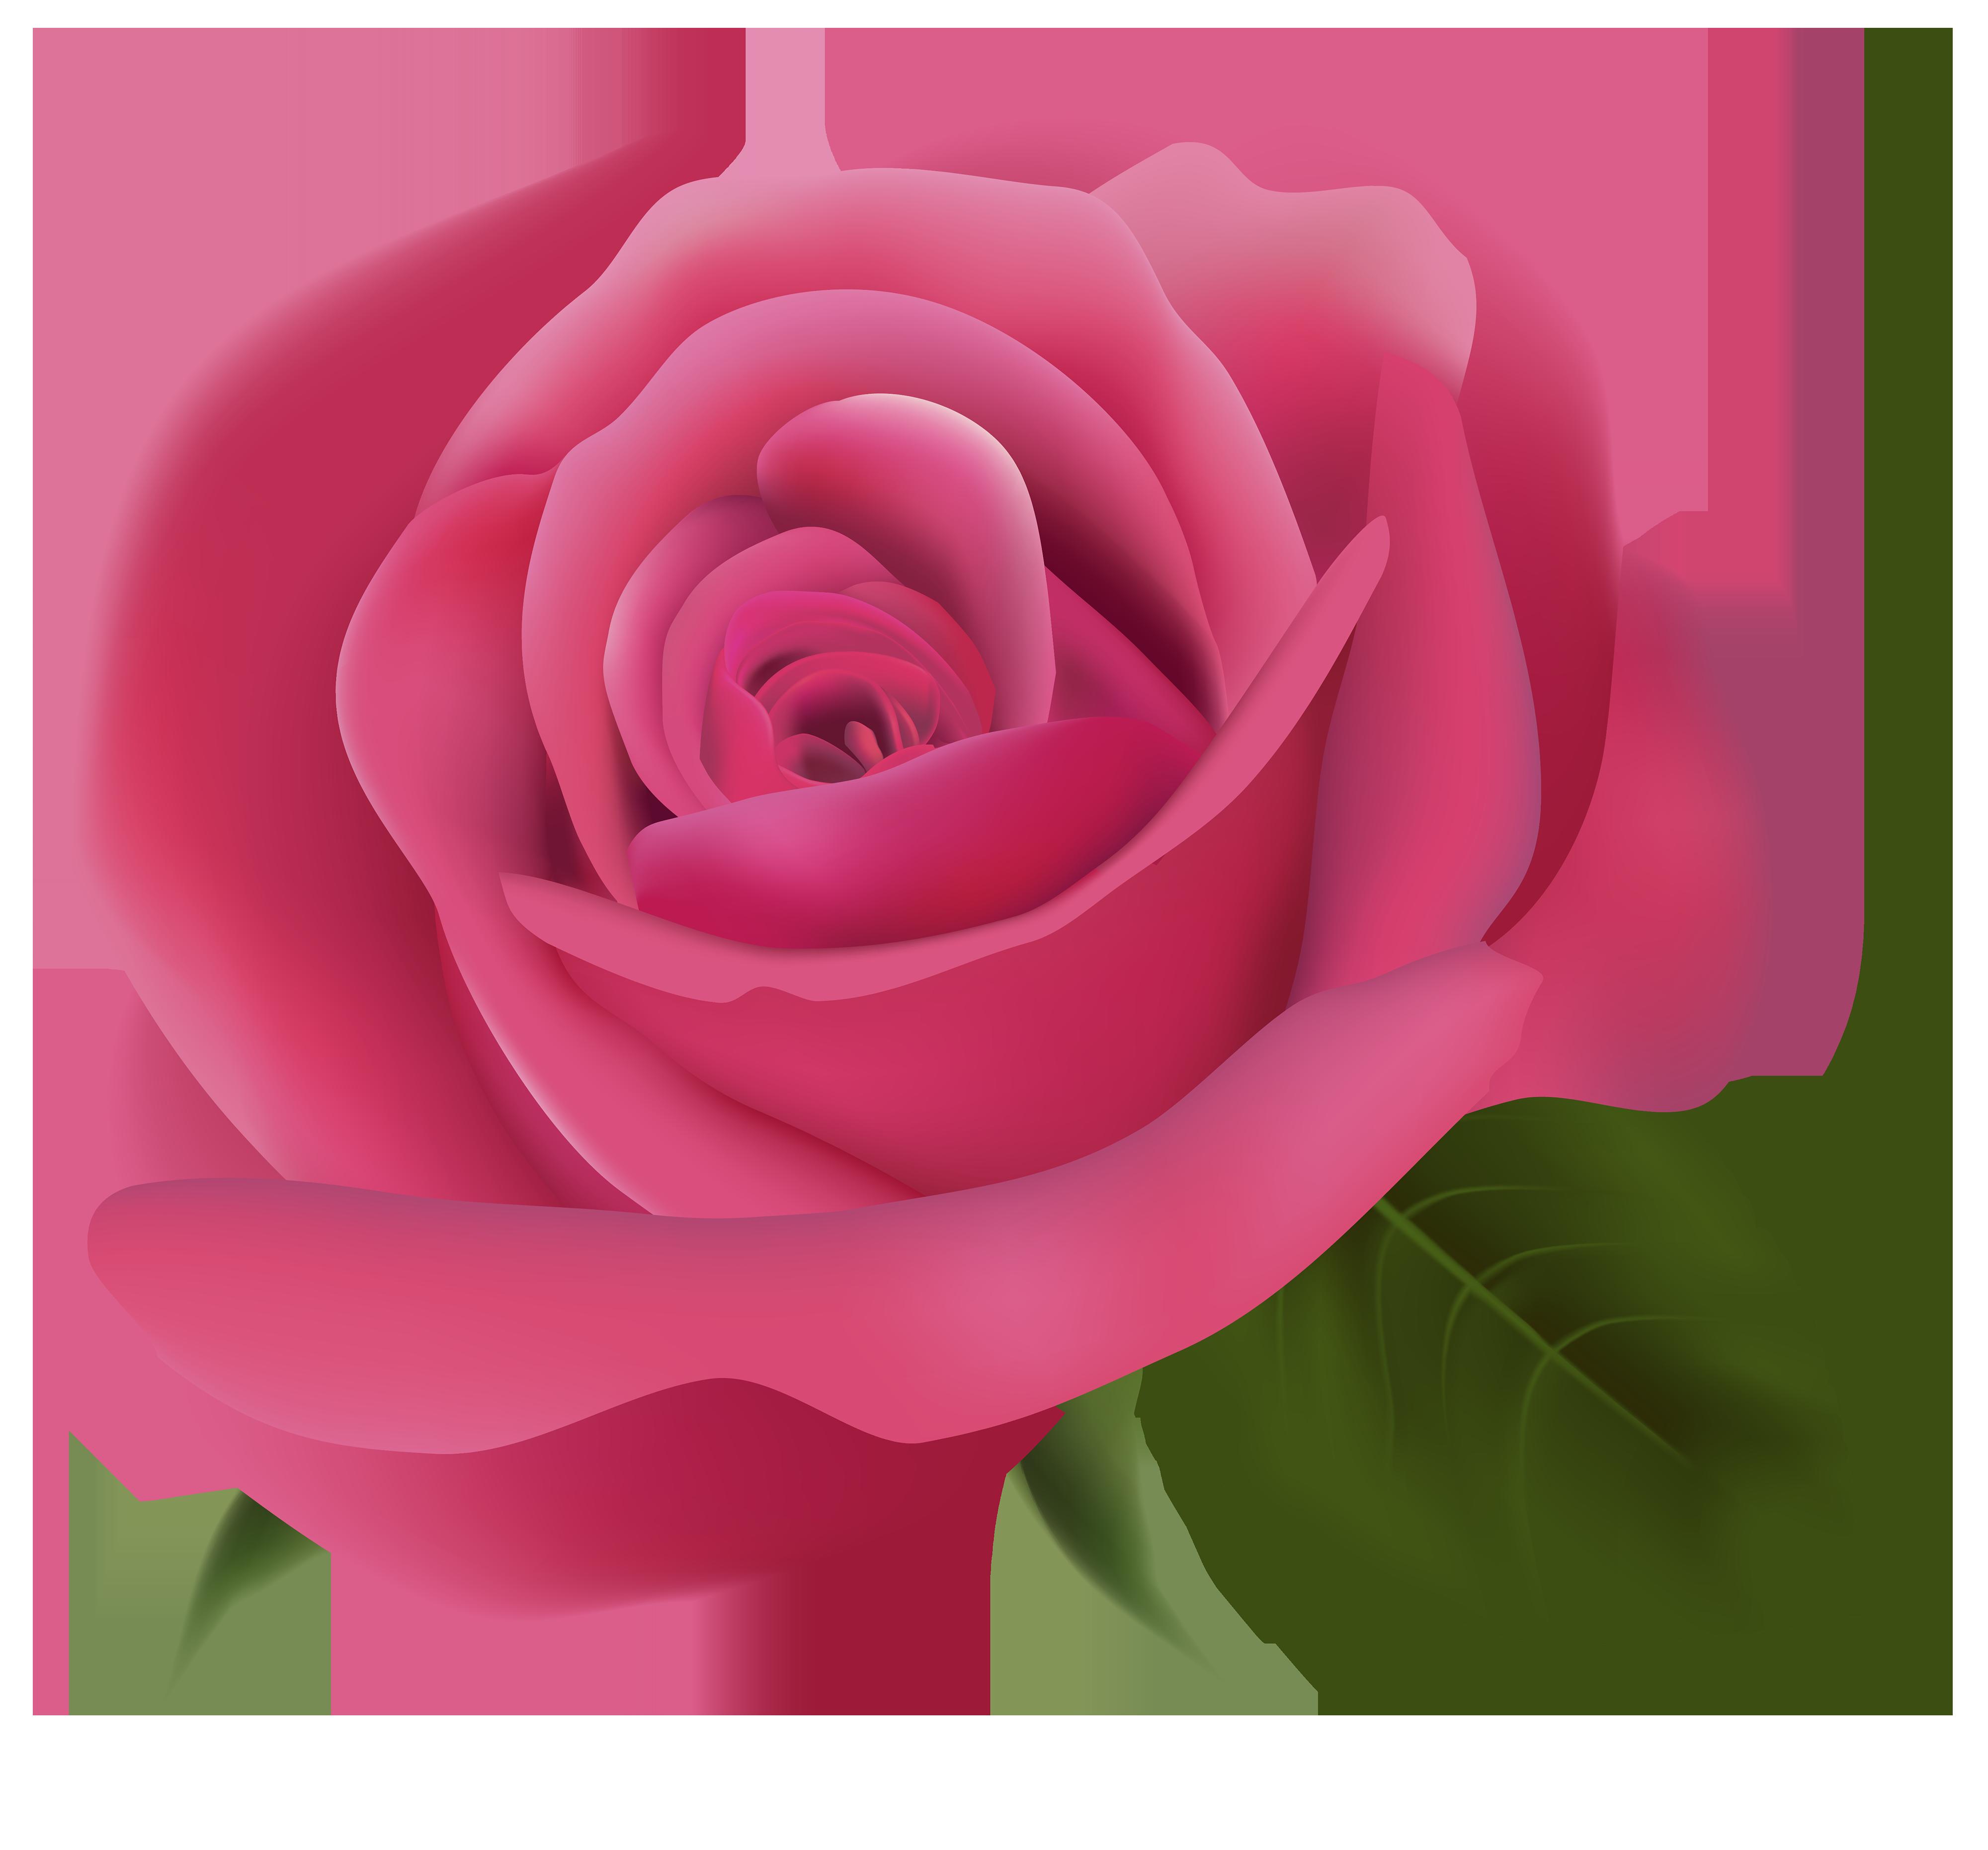 Pink rose transparent background. Clipart roses knife